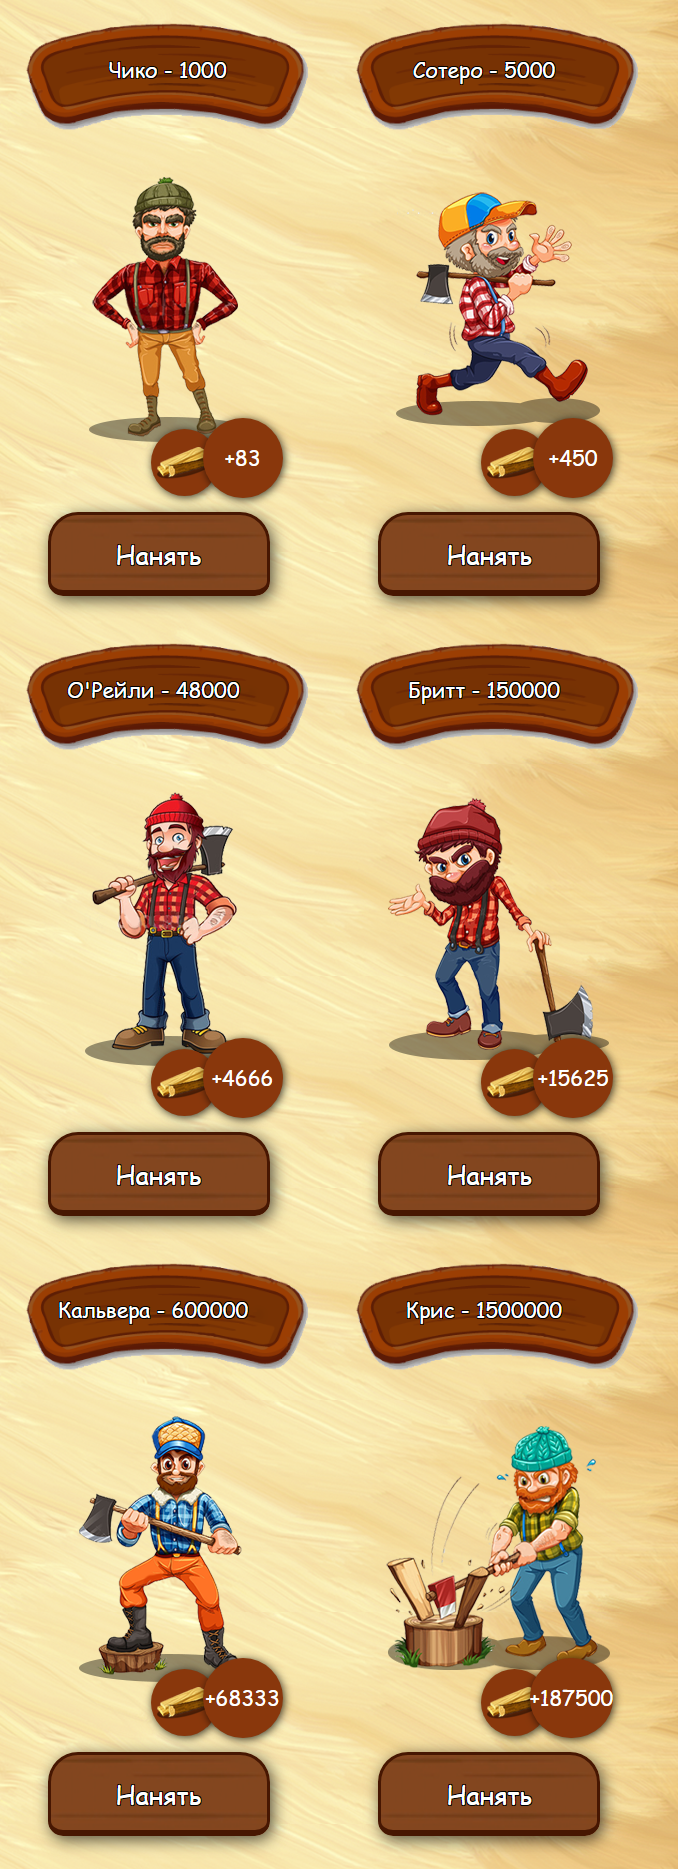 Woodman Game - woodman-game.biz - маркетинг игры